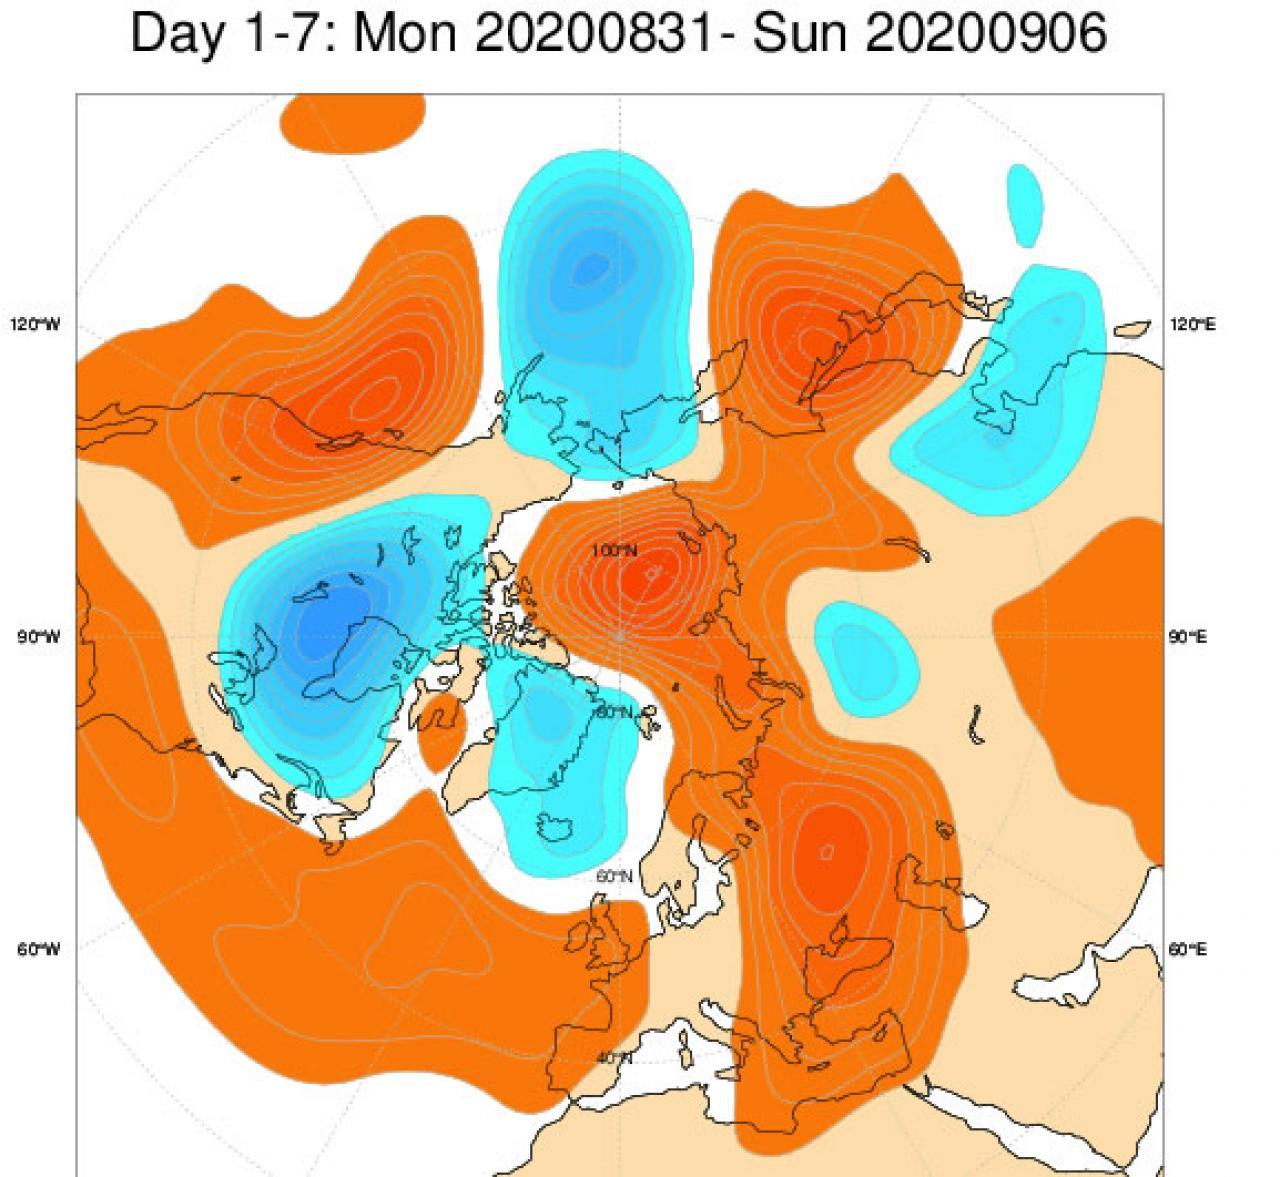 anomalie geop.500 hPa 31-6 settembre (fonte ecmwf)